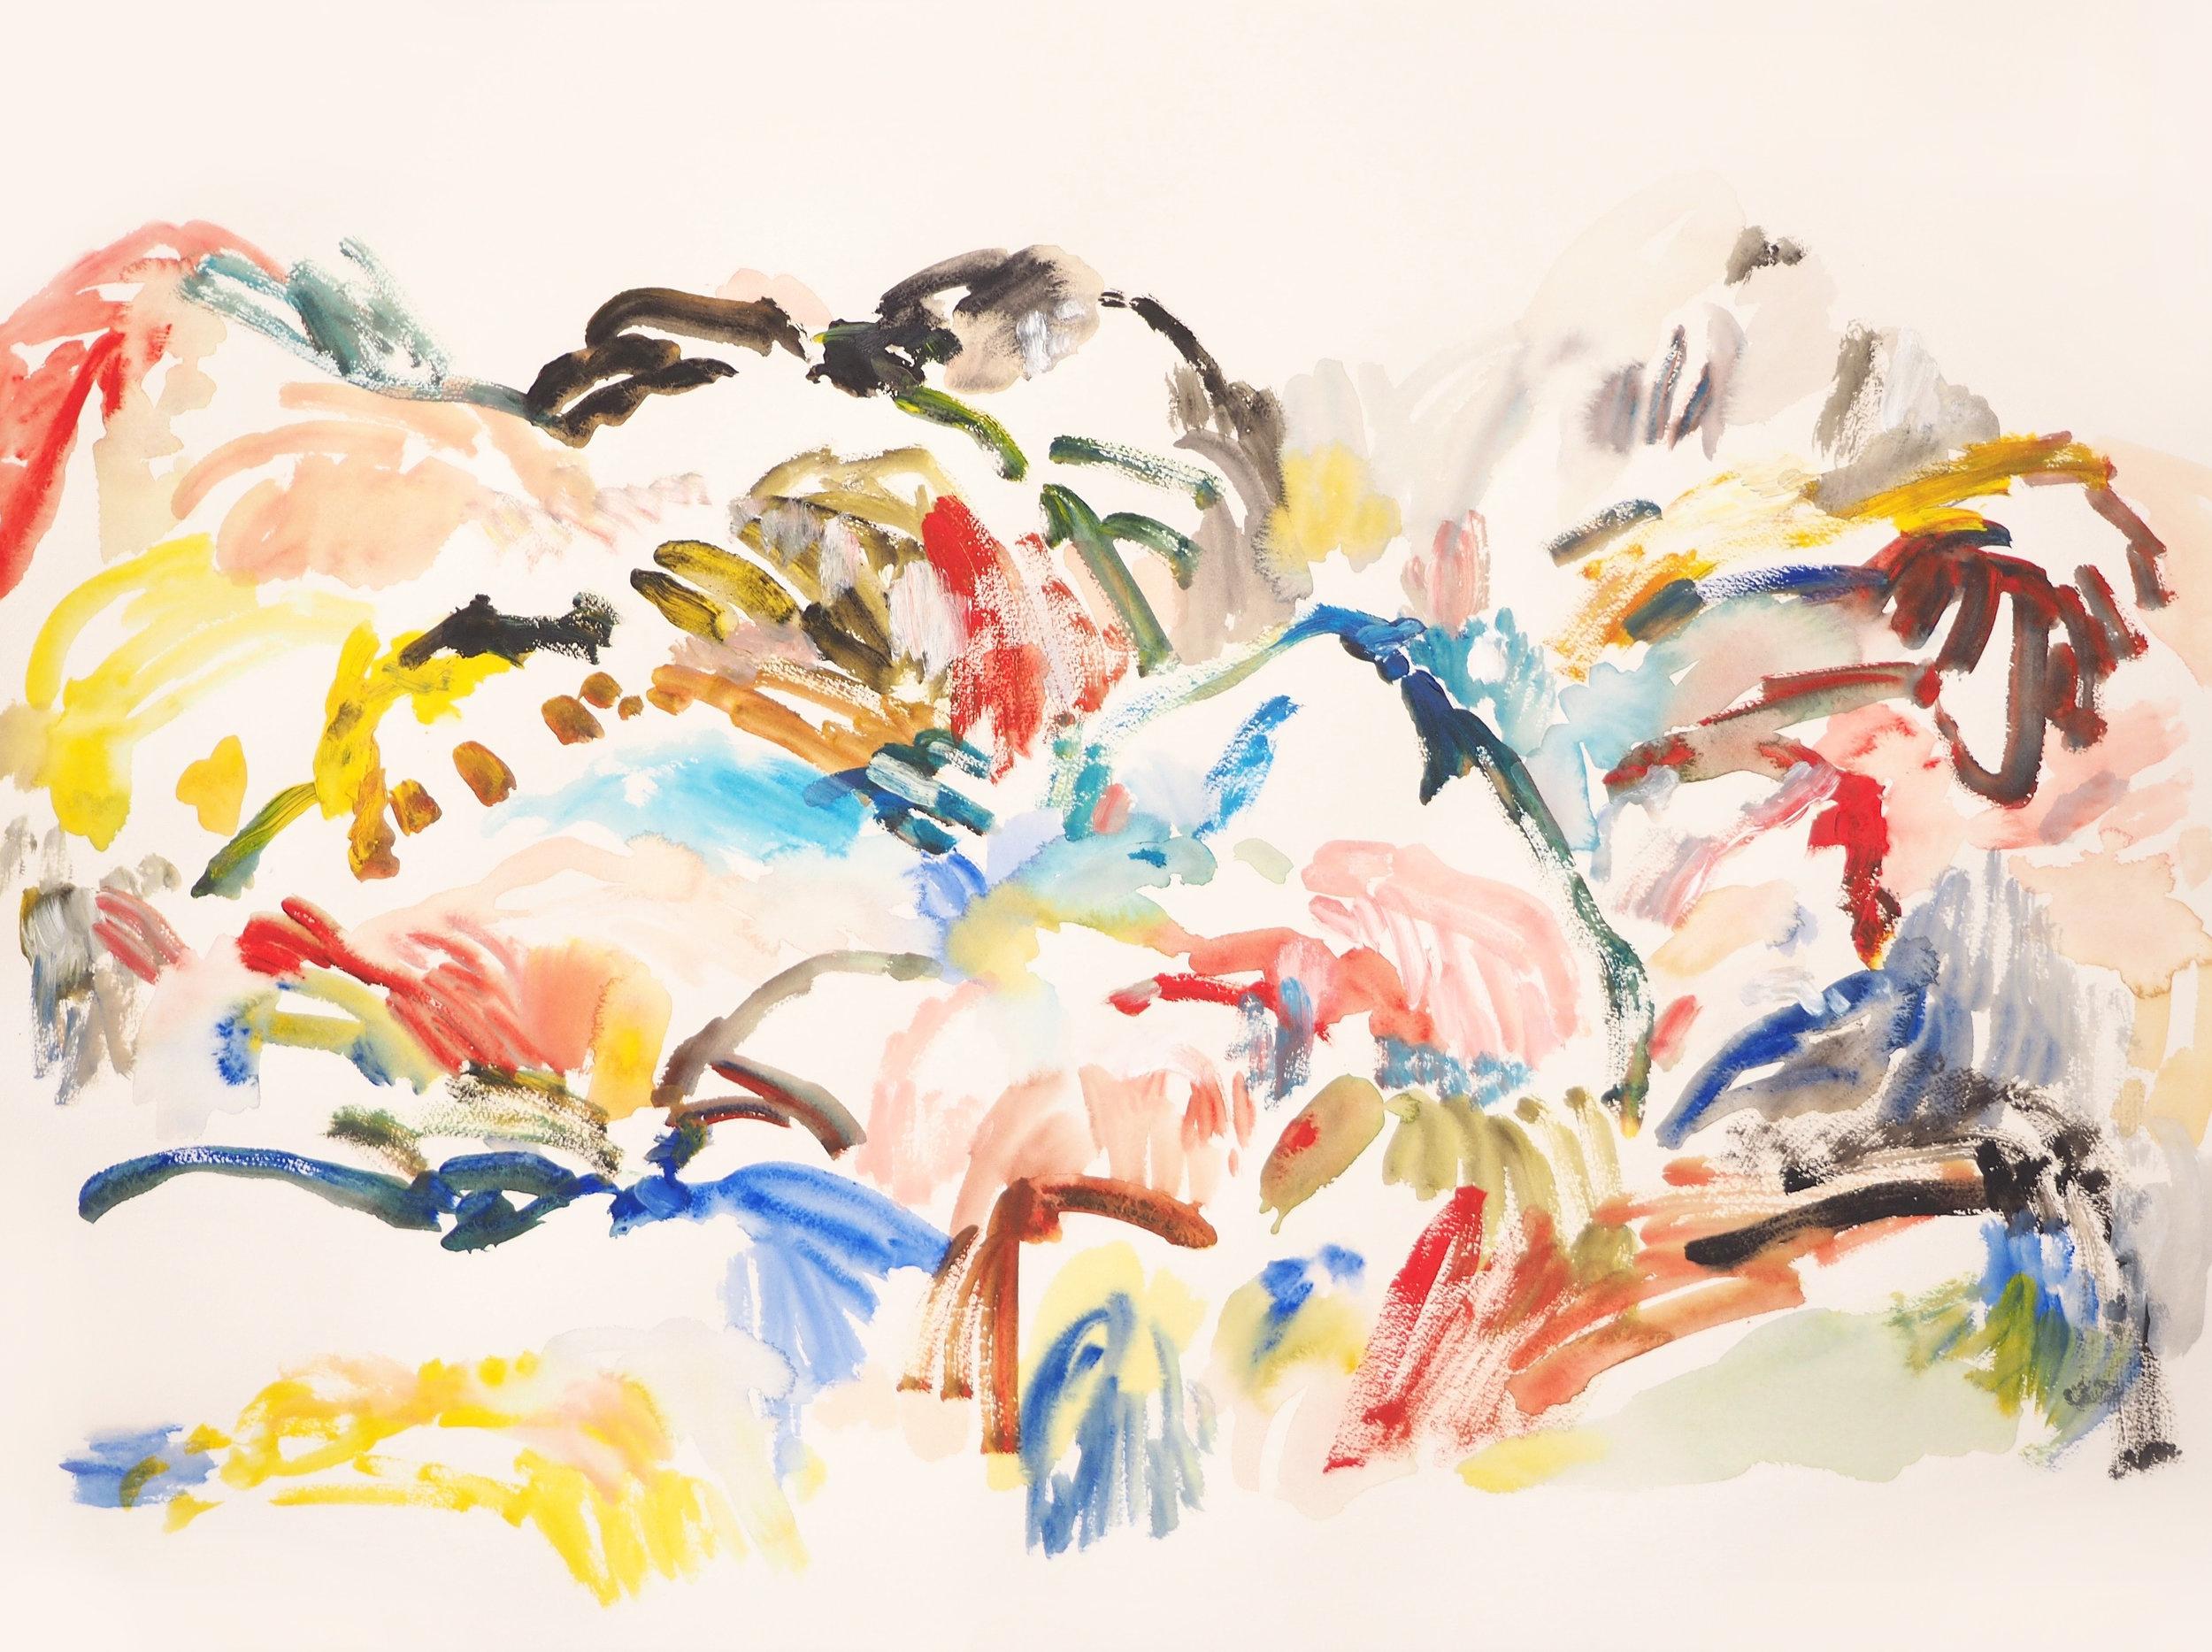 Mparntwe IV , 2017 Acrylic on paper 56 x 76 cm